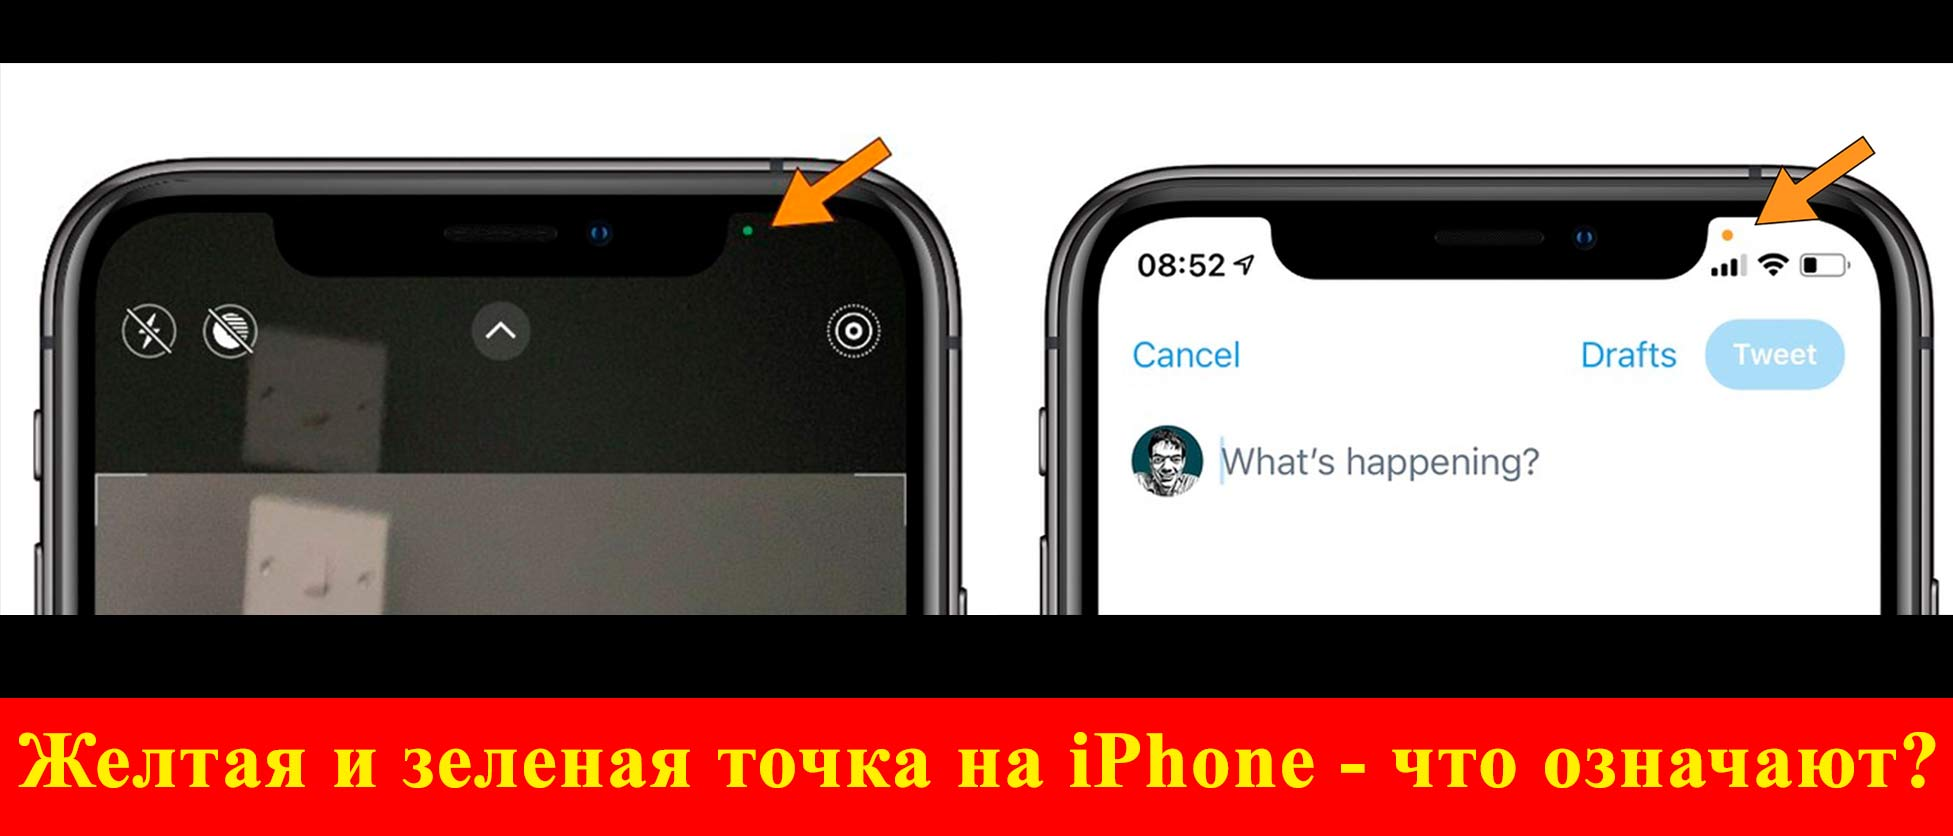 точка на экране iphone